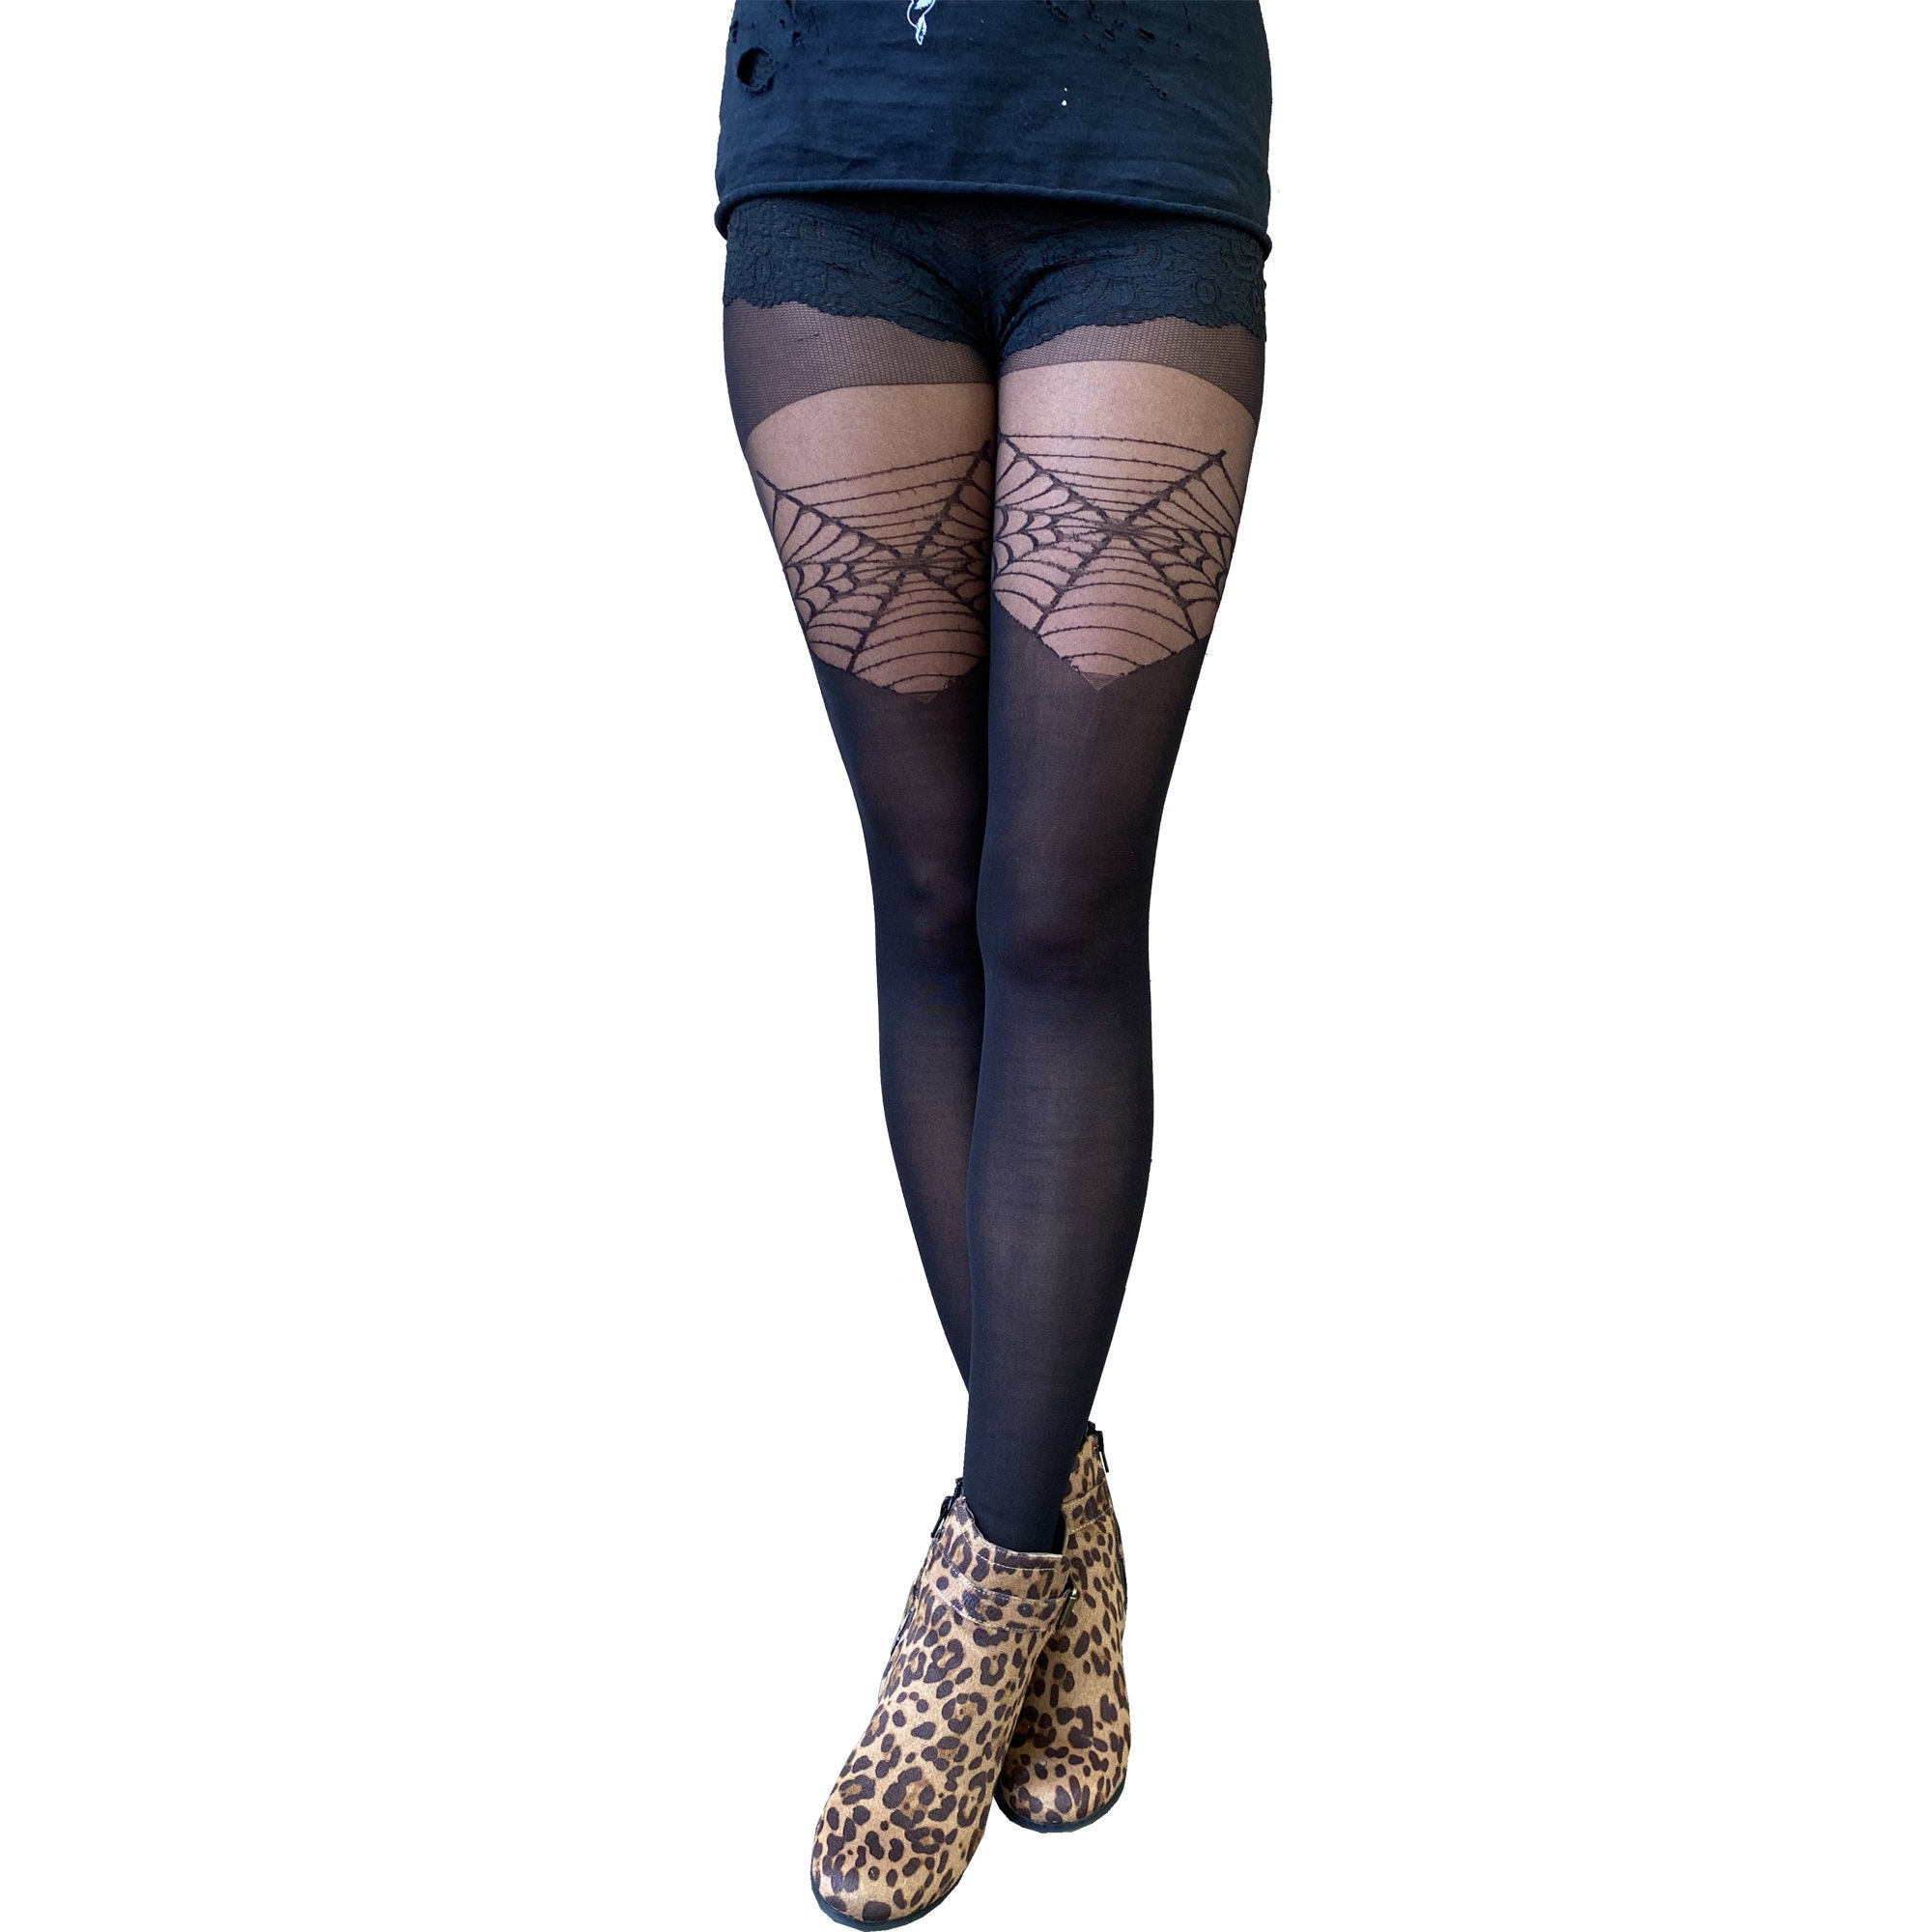 Tights Cobweb Over The Knee Women/'s Black